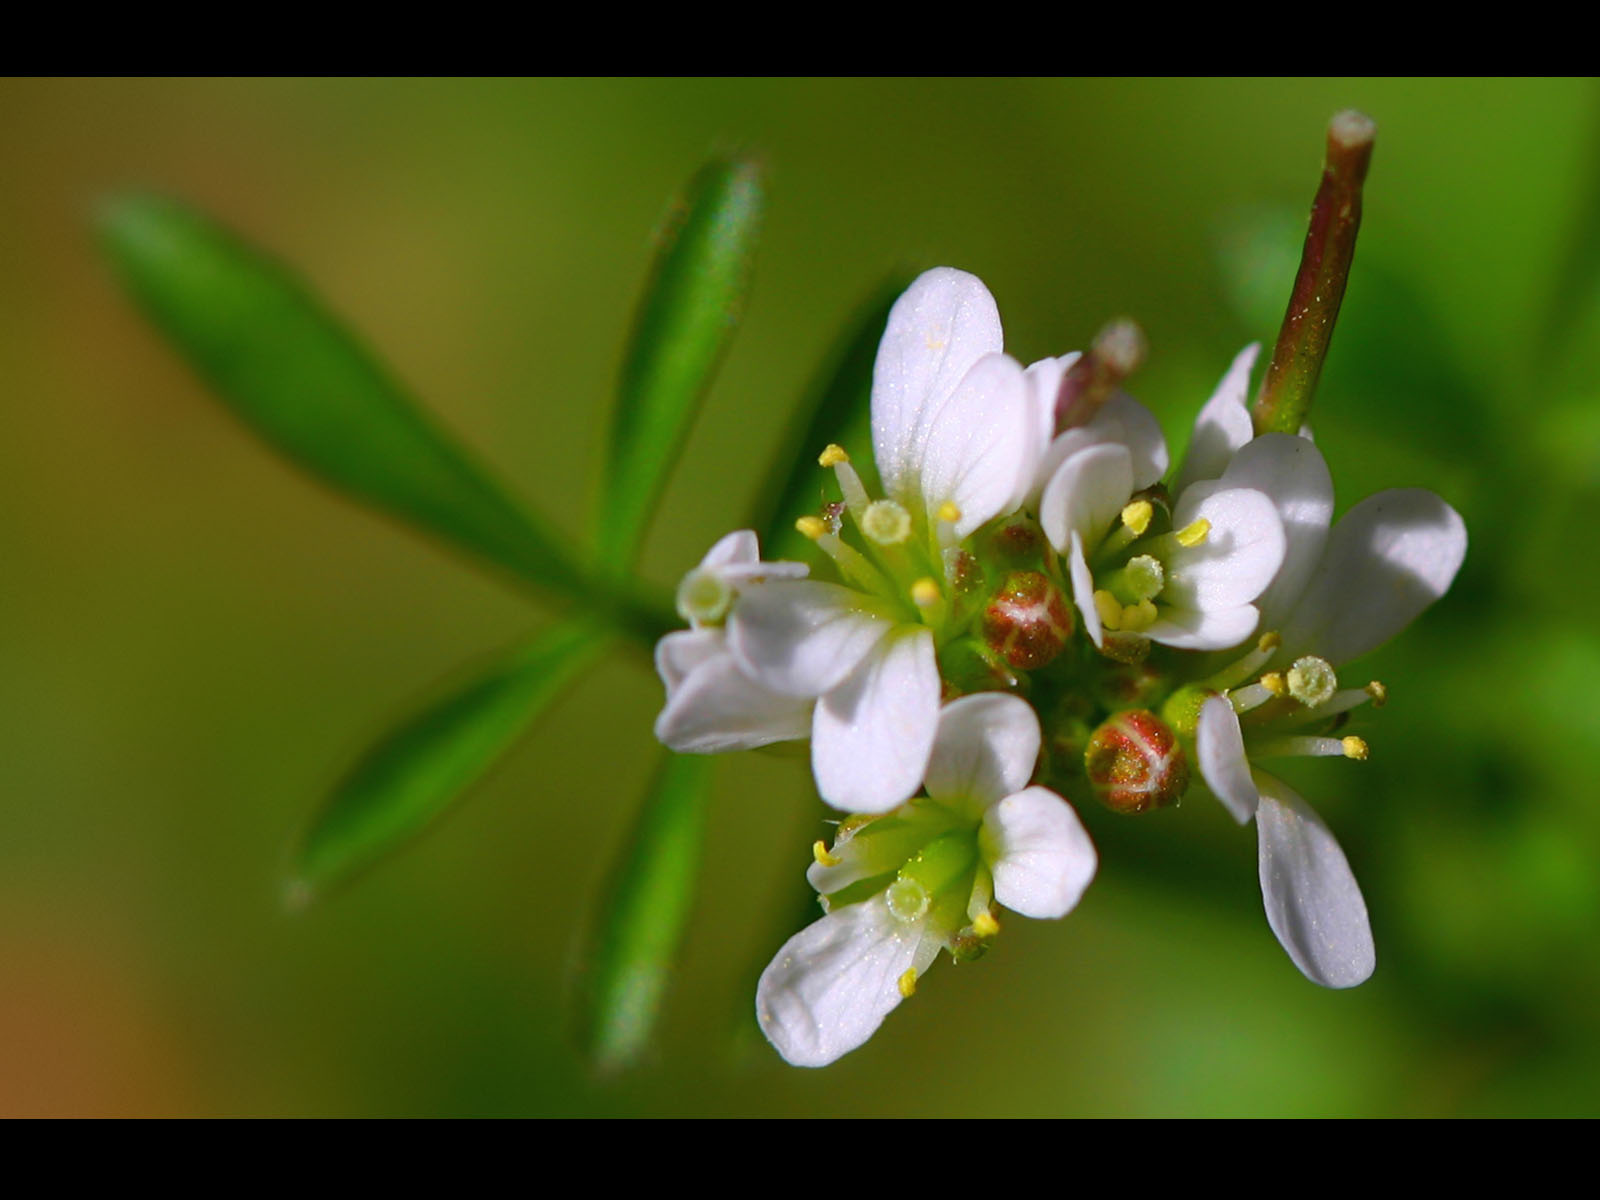 http://4.bp.blogspot.com/_vClfjdJc8Jk/TTsHOycHCtI/AAAAAAAAE0I/Ctrva6tCOOo/s1600/spring-flowers-wallpapers_12418_1600x1200.jpg